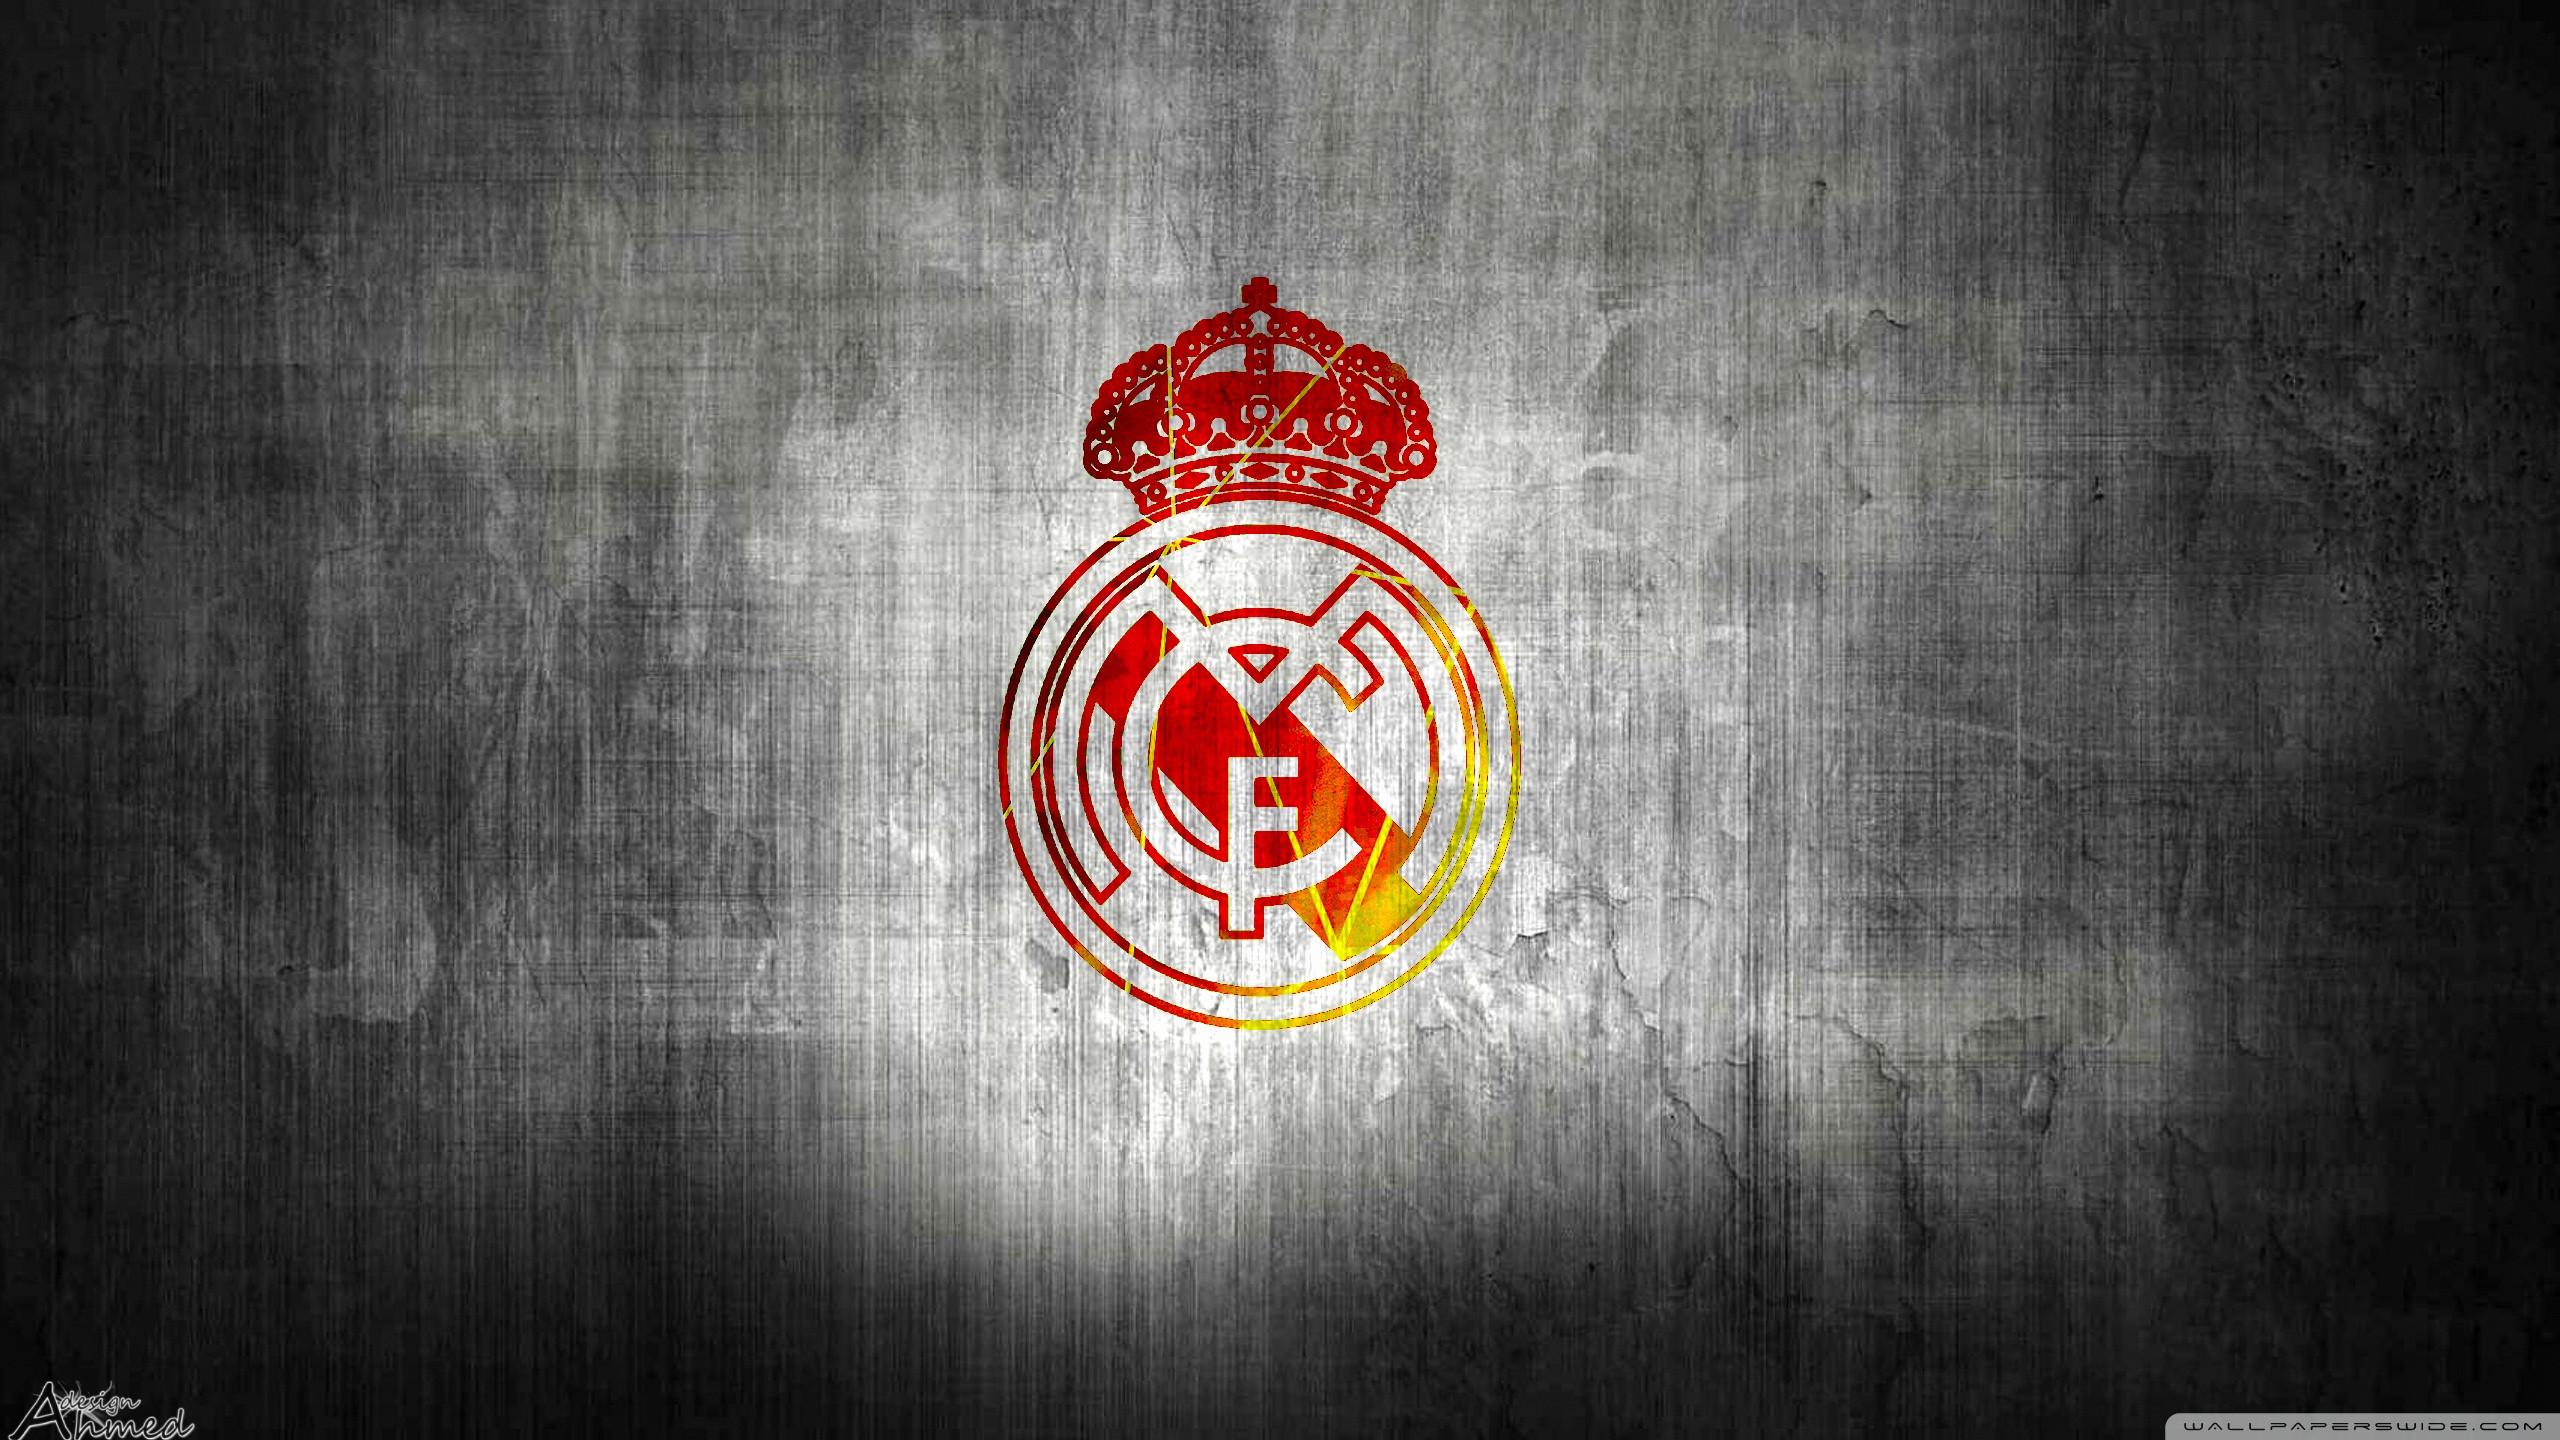 Res: 2560x1440, Real Madrid Wallpaper Unique Real Madrid â ¤ 4k Hd Desktop Wallpaper for 4k  Ultra Hd Tv